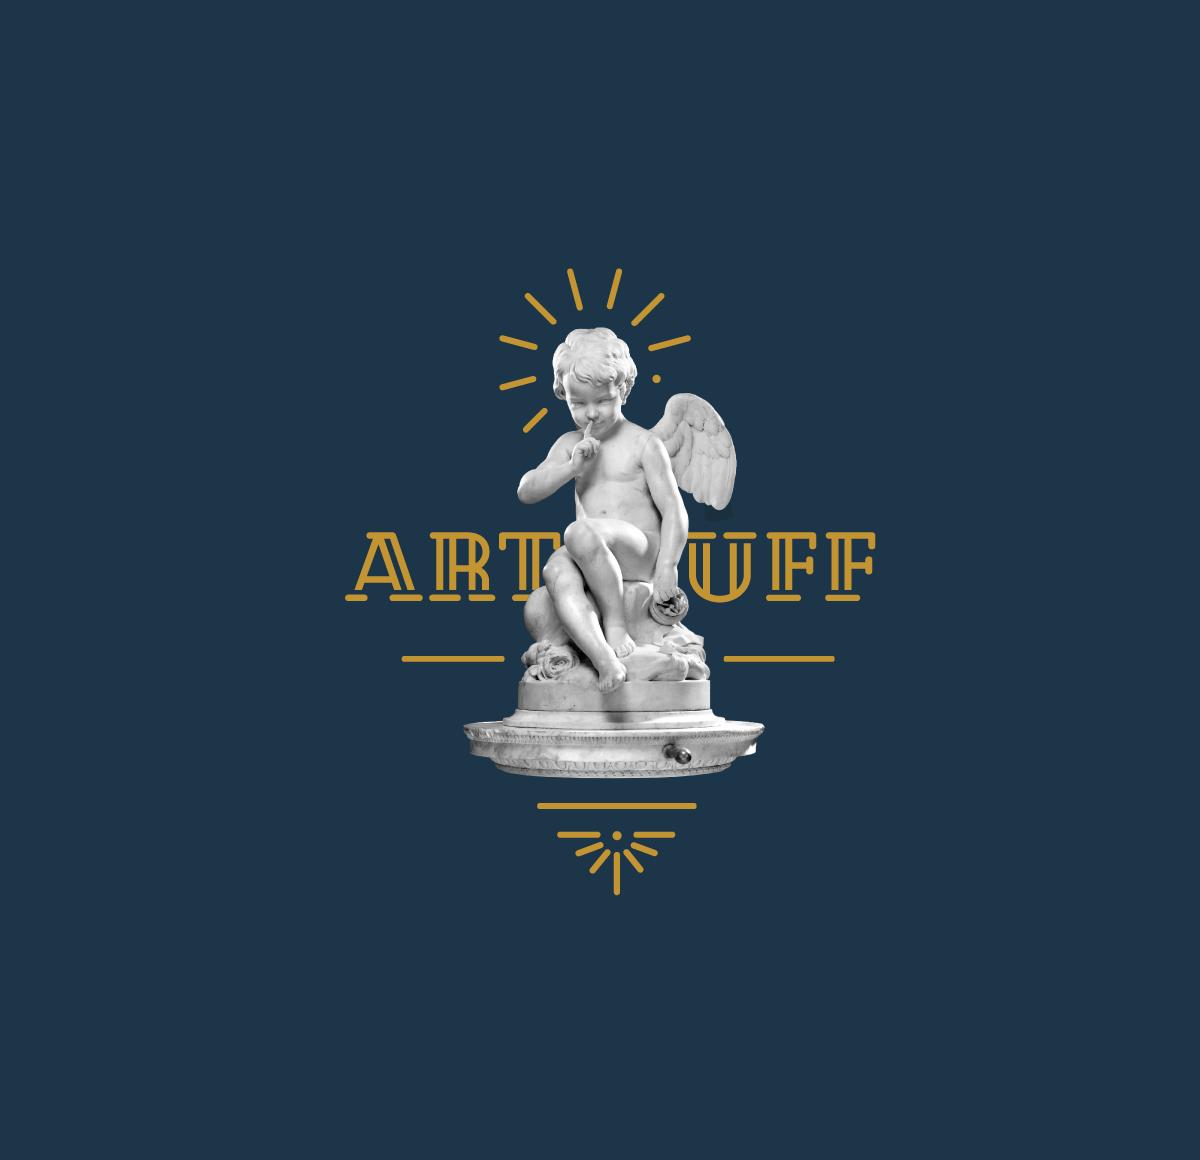 art toy toys angel Clothing Fashion  handmade branding  graphic design  identity